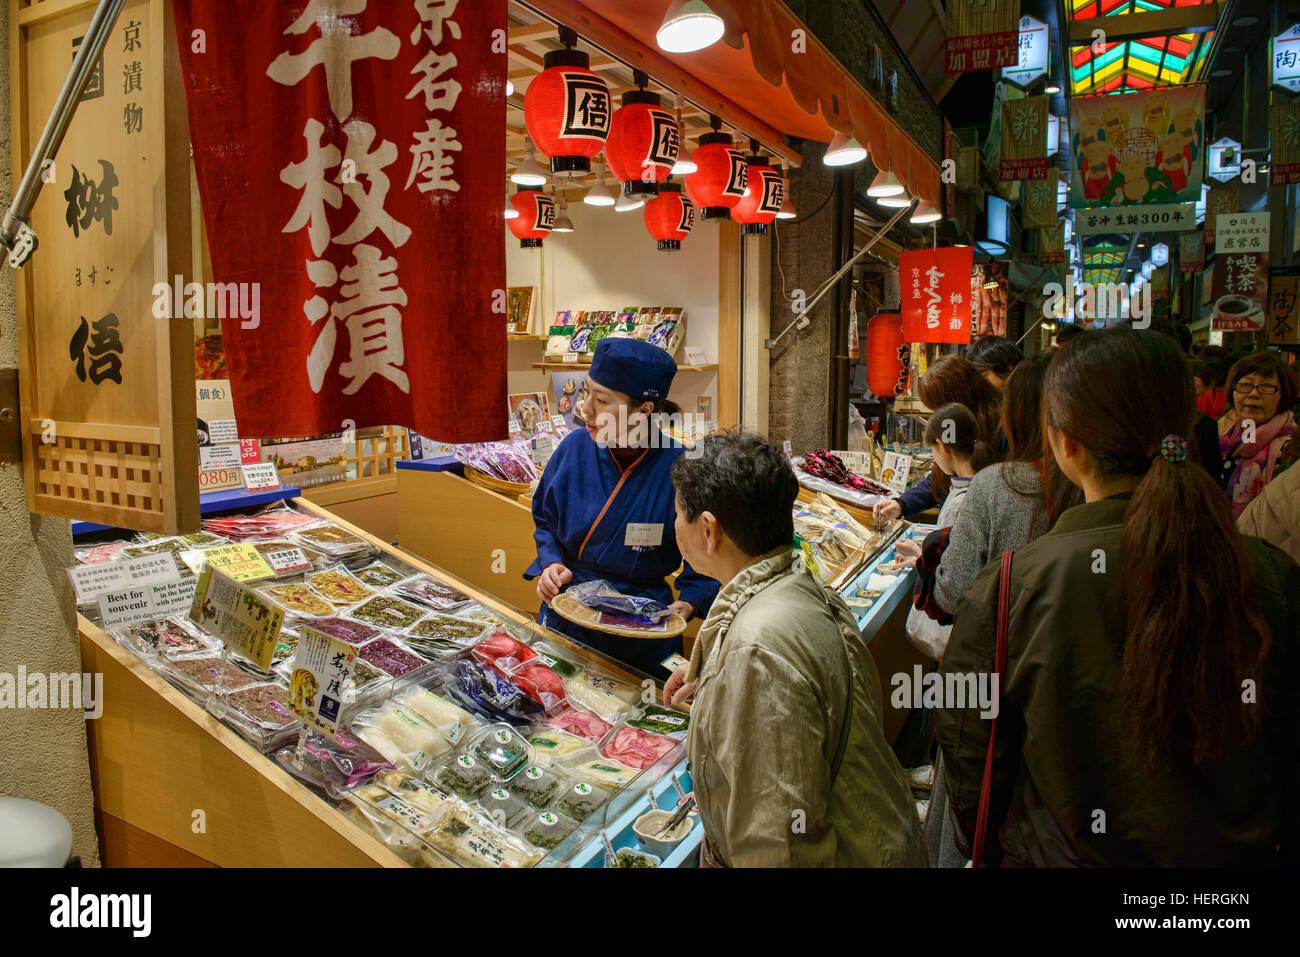 Einkaufen in Nishiki Markt, Kyoto, Japan Stockbild